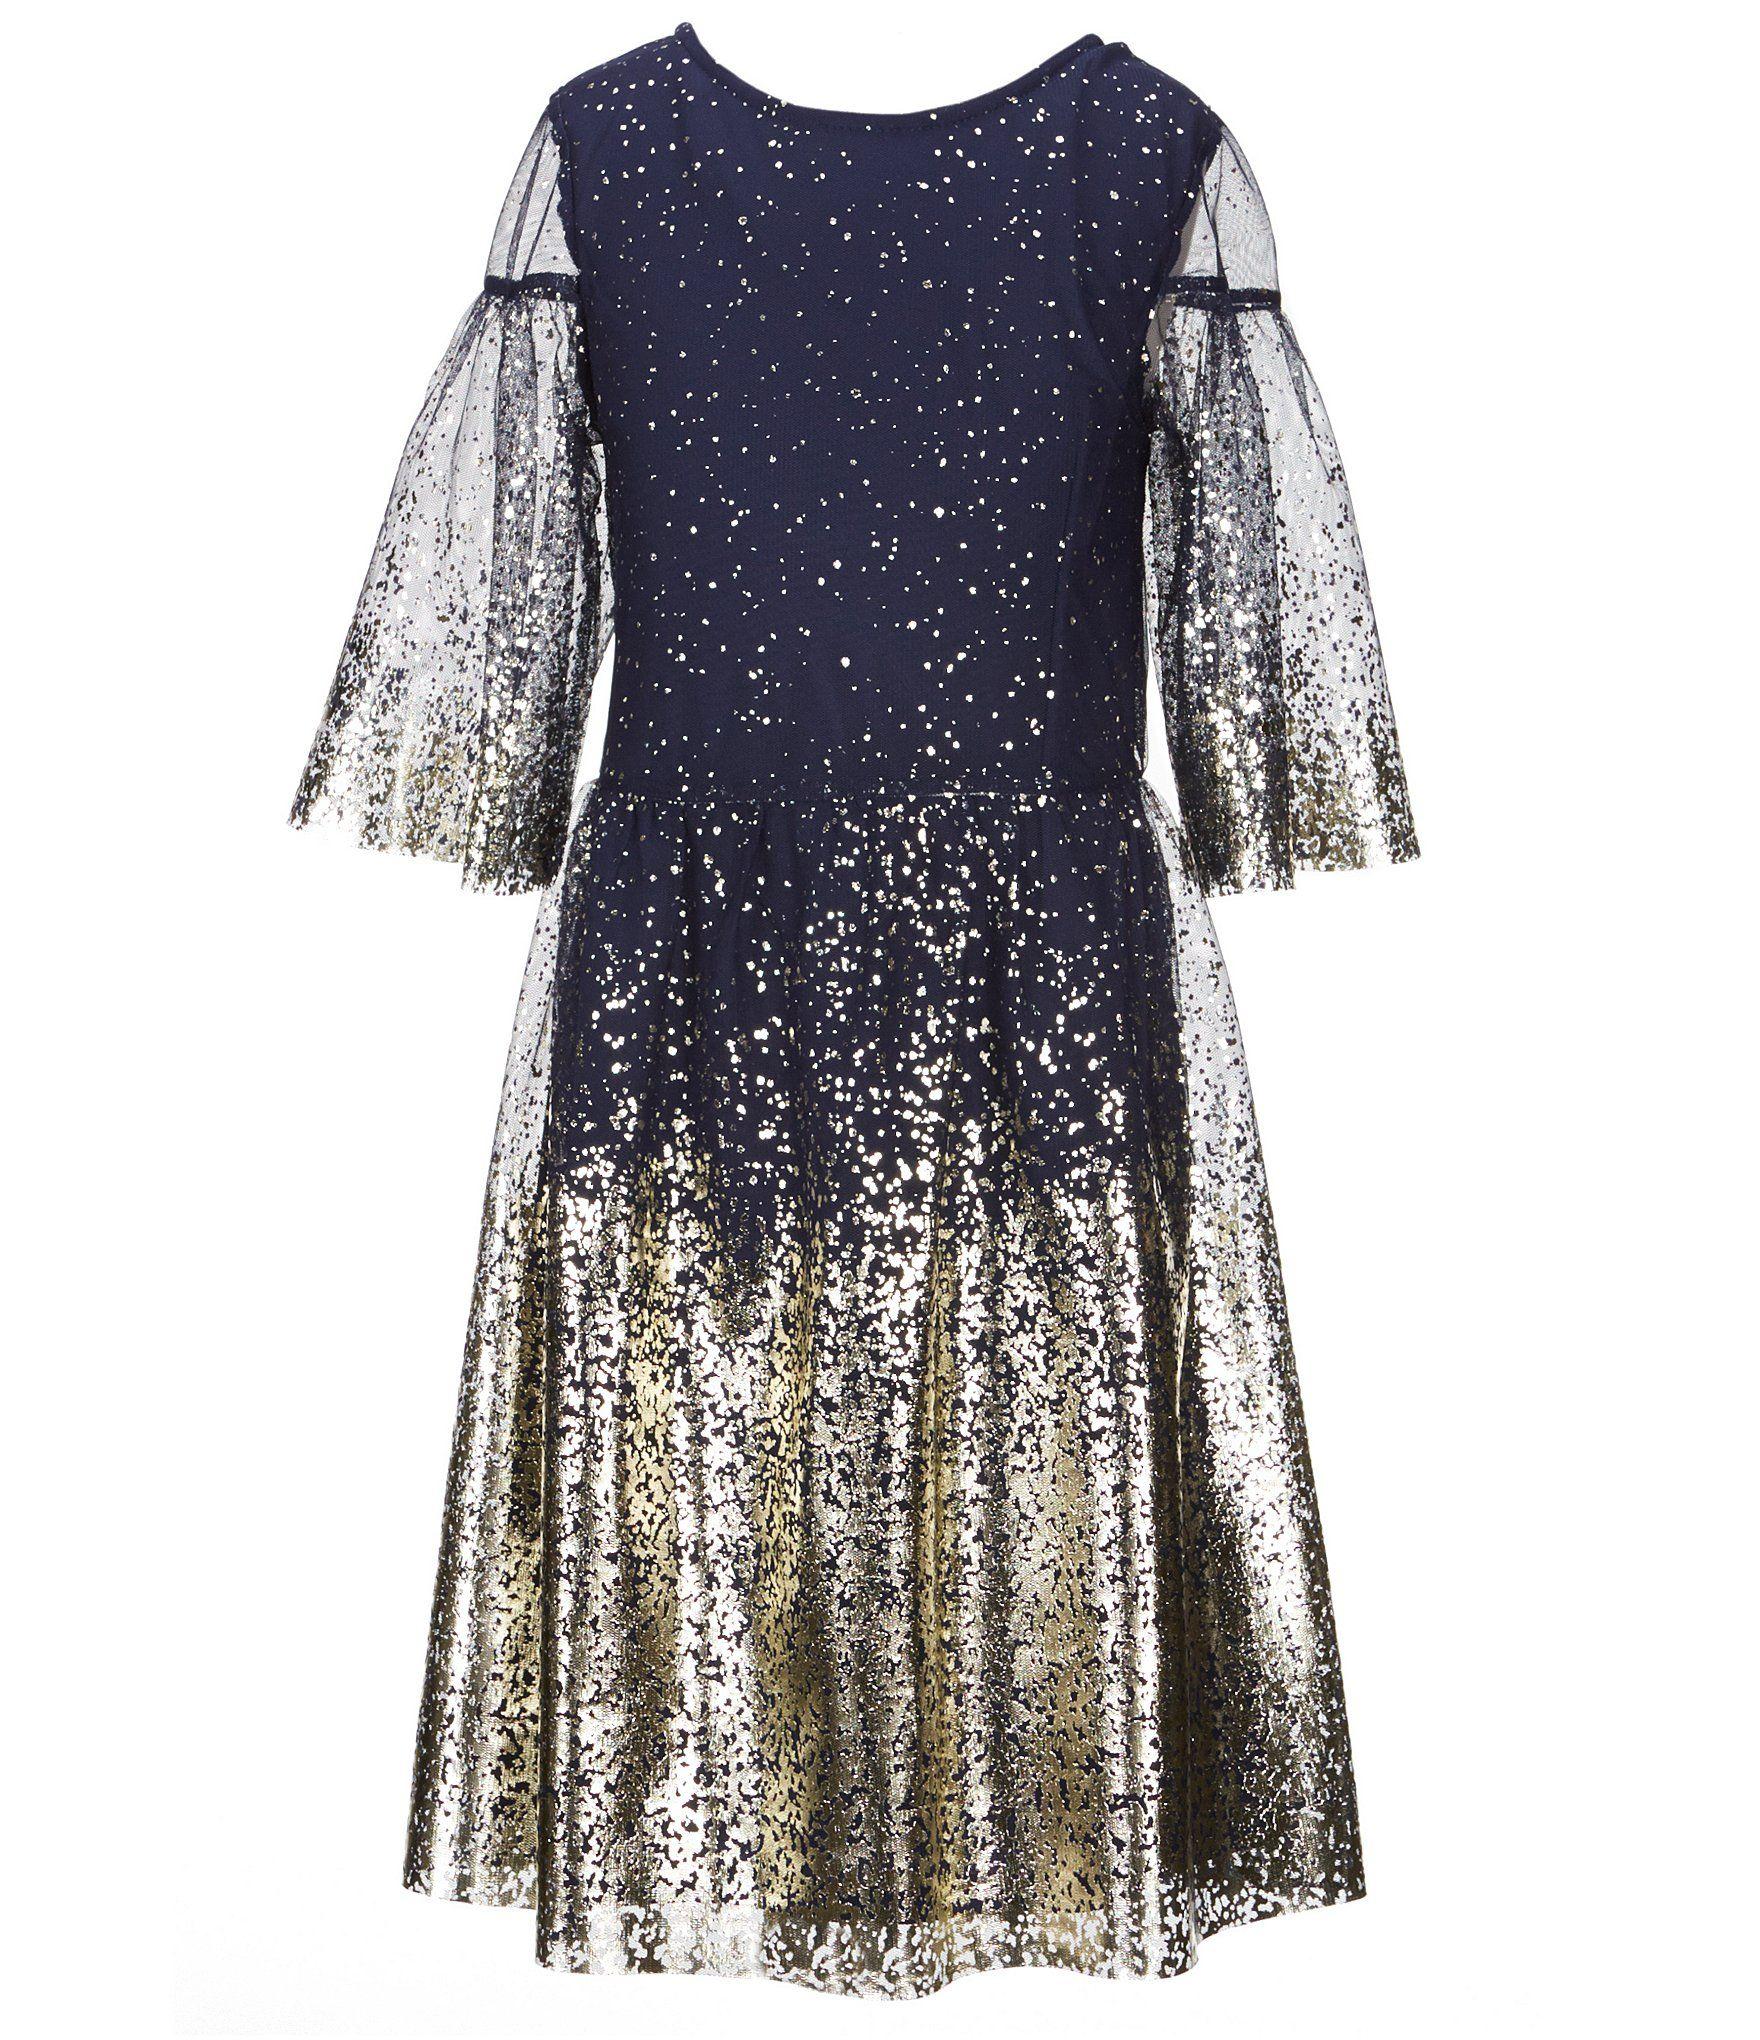 b1245925ee1 Shop for GB Girls Big Girls 7-16 Metallic Foiled Mesh Dress at  Dillards.com. Visit Dillards.com to find clothing